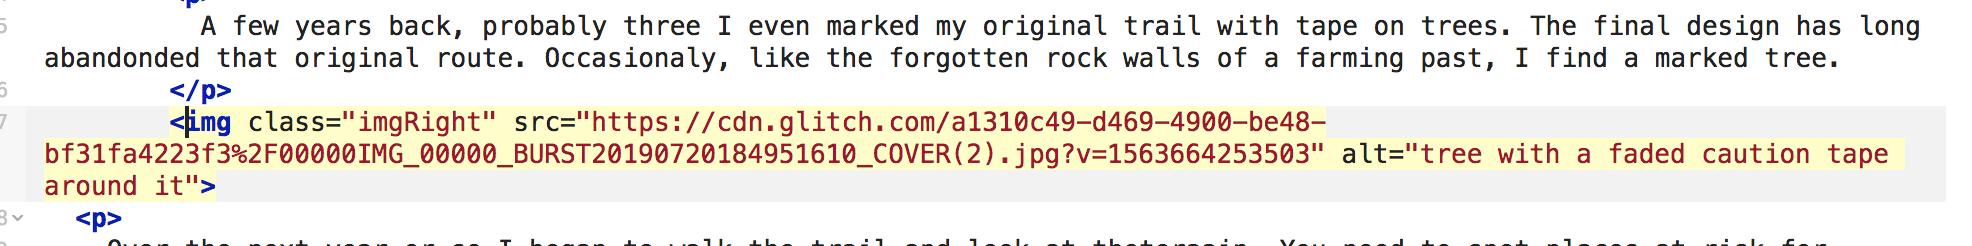 screenshot of highlighted img tag